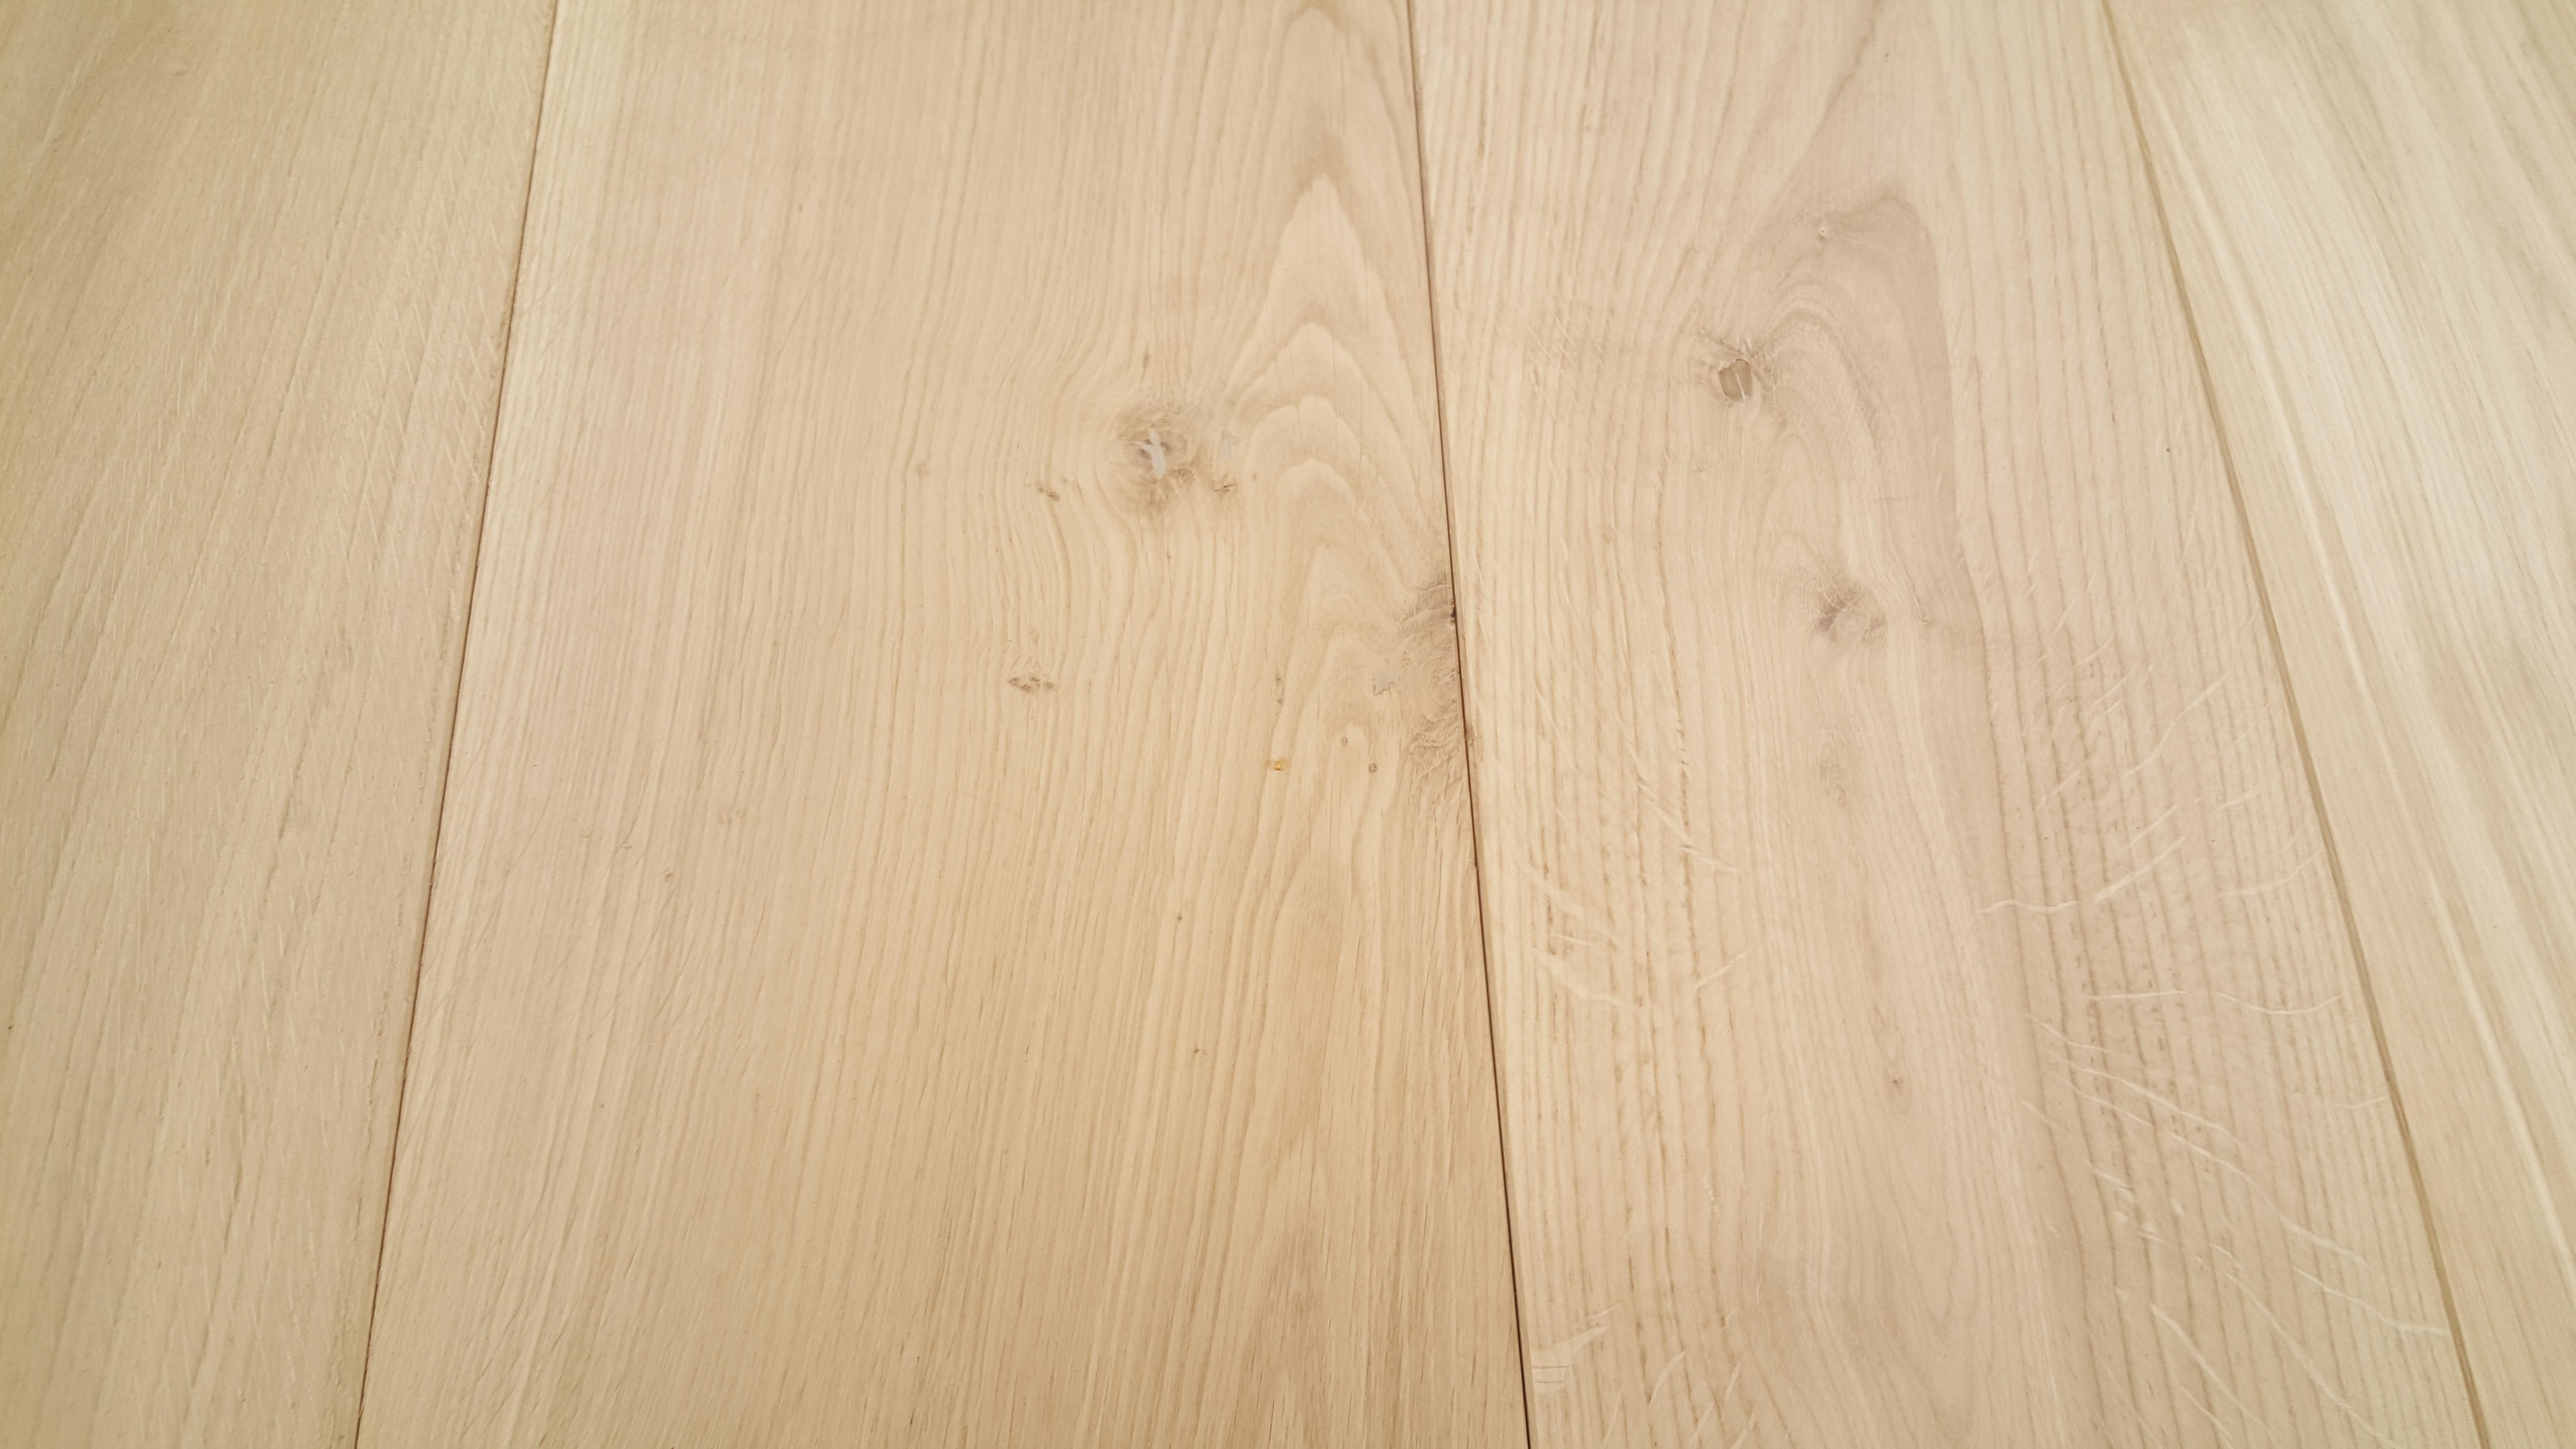 Engineered Mountain Oak Wood Flooring Uk Based